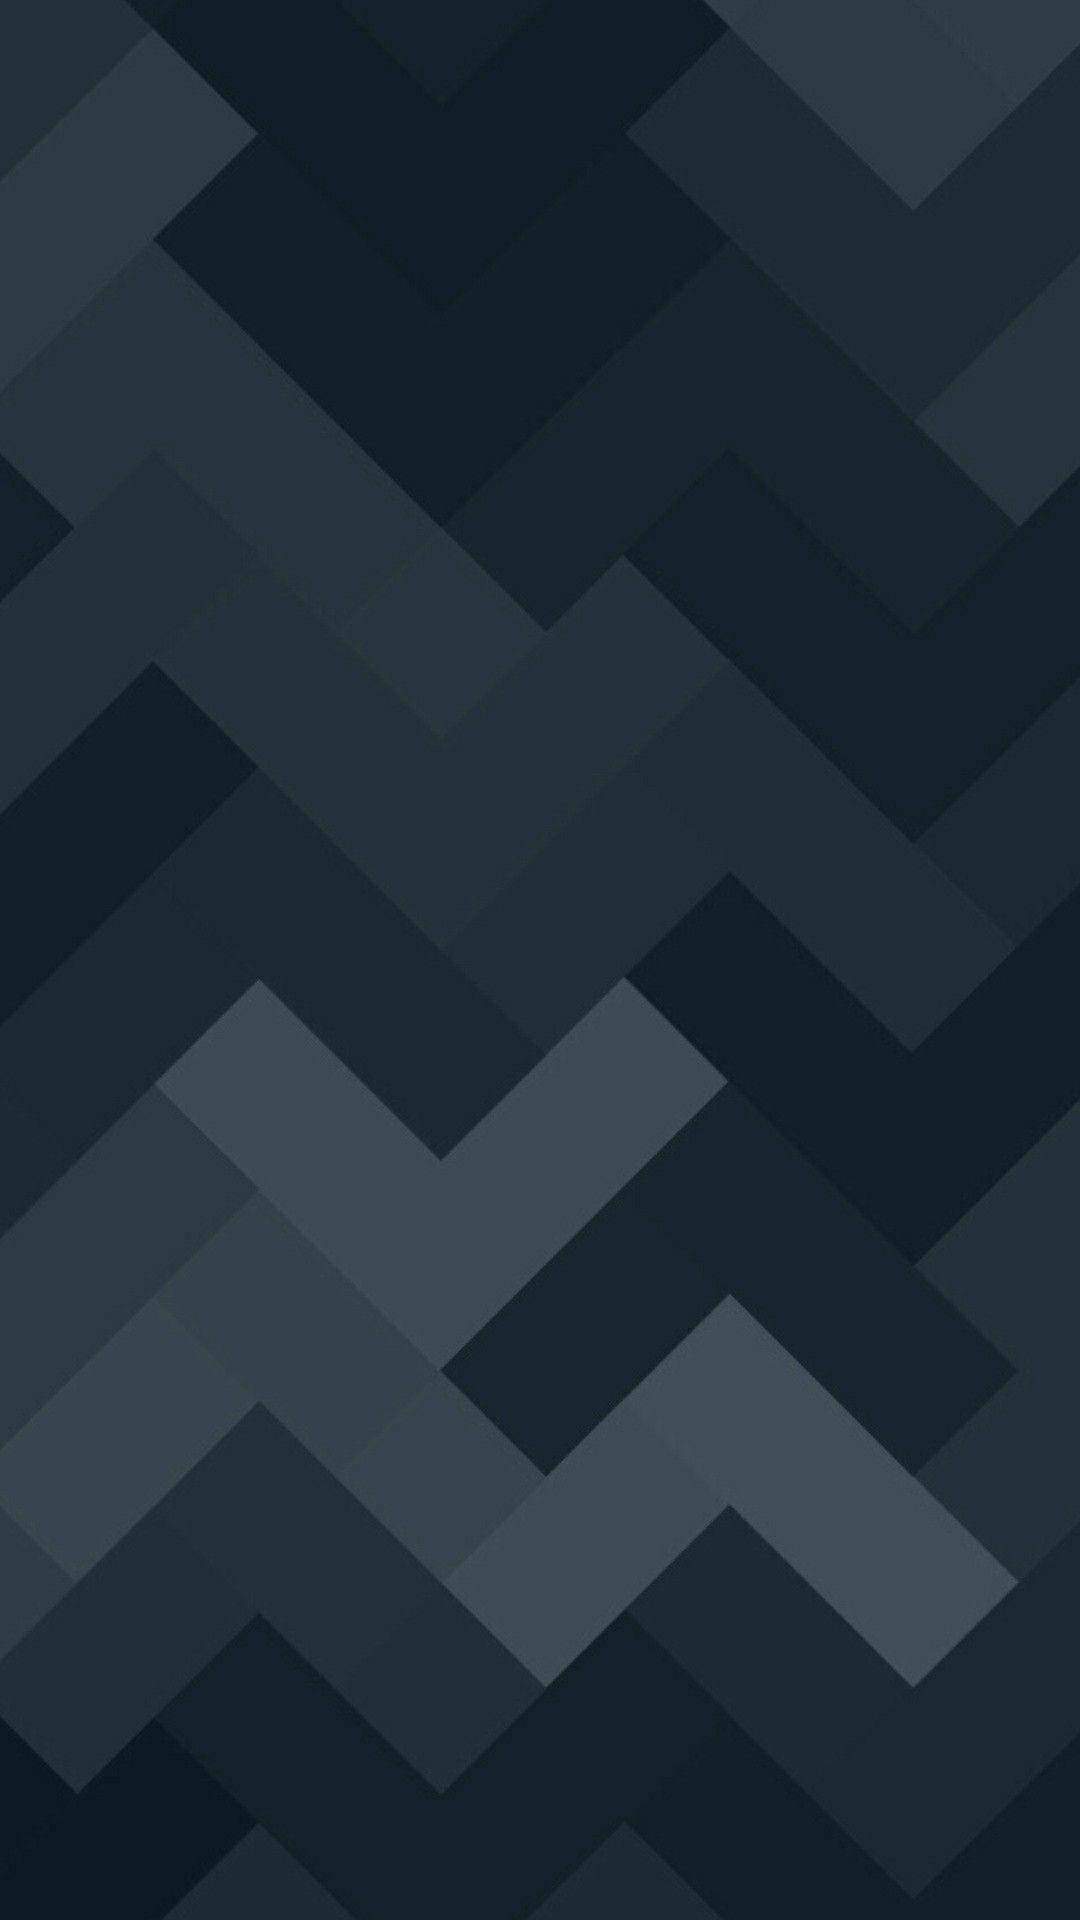 Pin By Fabrizio Velasquez On 21 Geometric Wallpaper Iphone